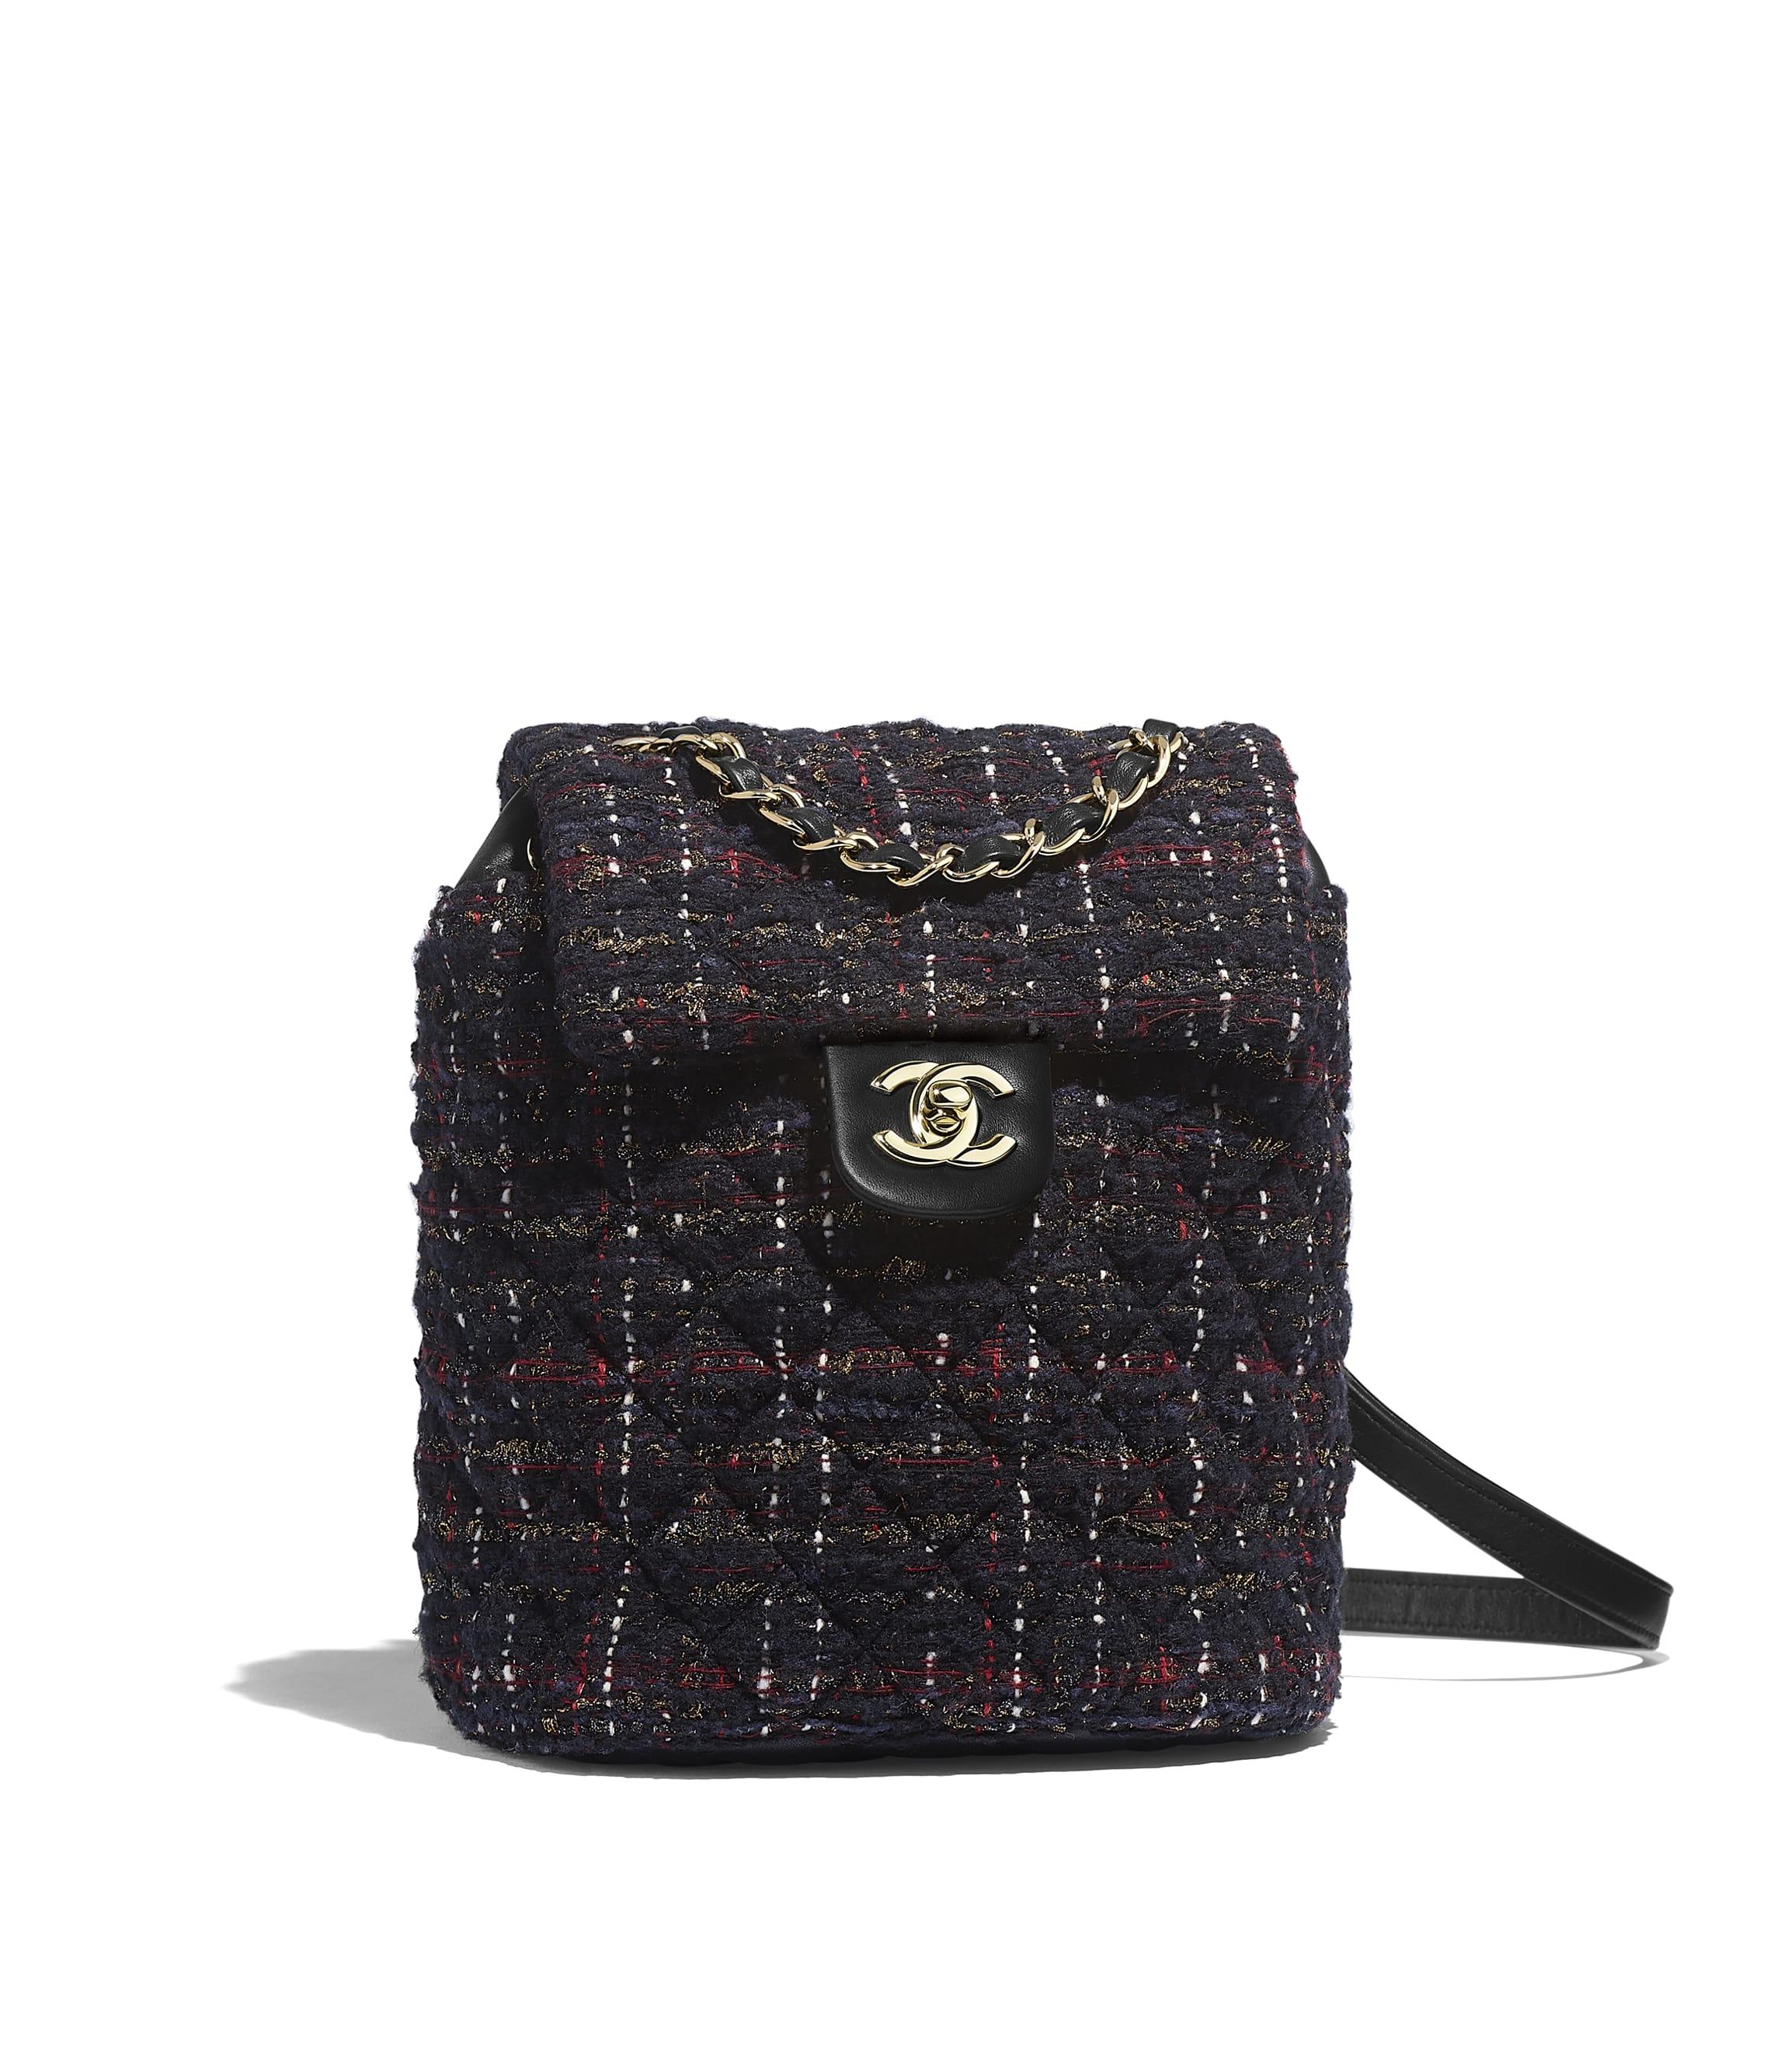 d45070c6b0 Backpacks - Handbags - CHANEL